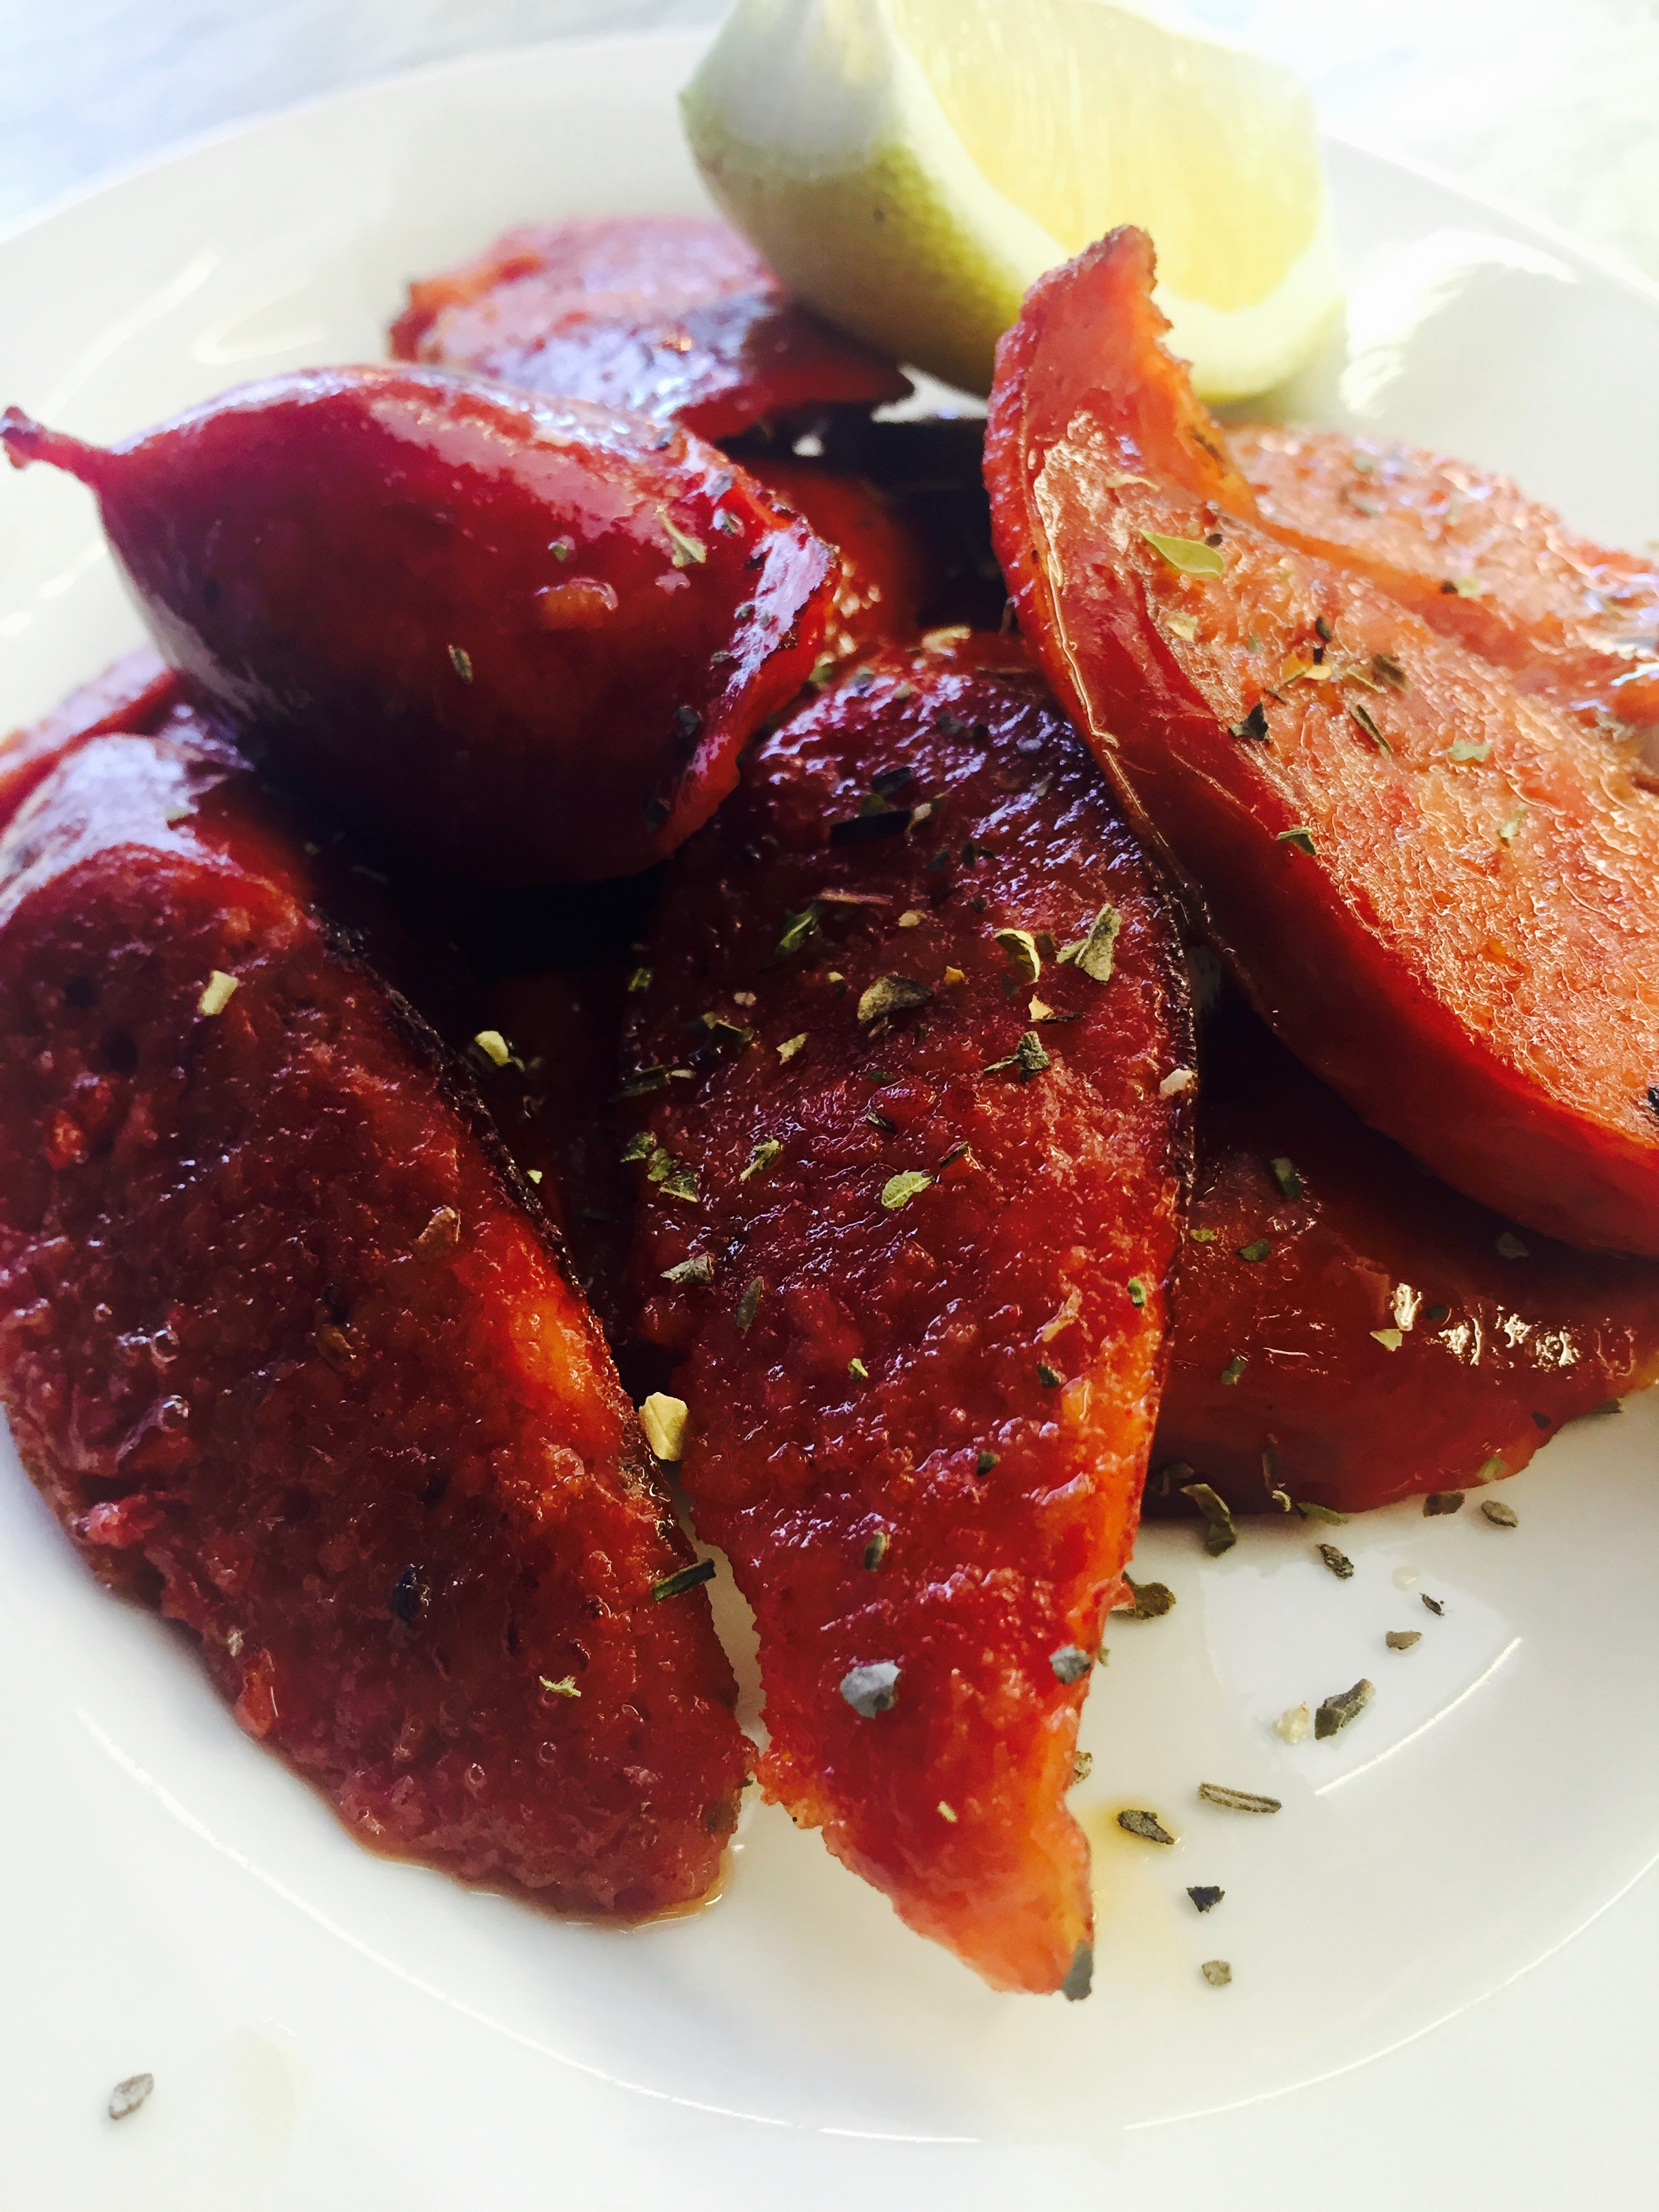 Loukaniko (spicy sausage)